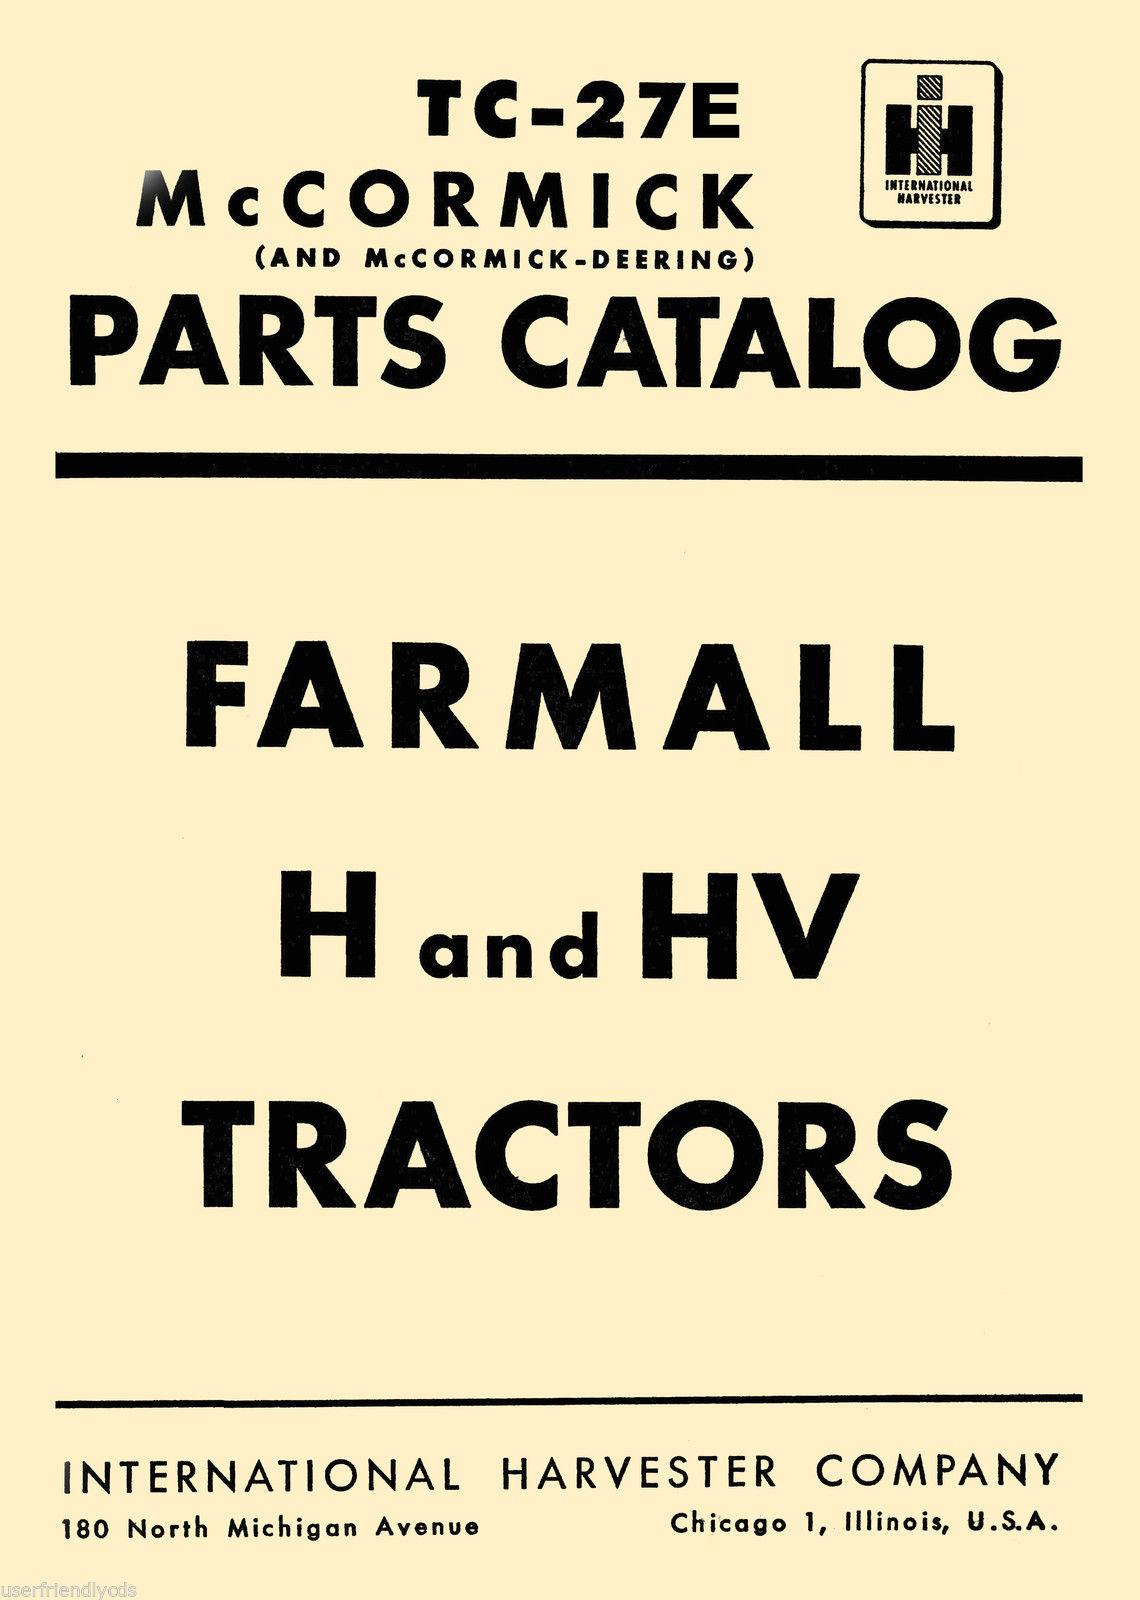 kgrhqrhjeufhwlricqobr1yjchuyq 60 57  kgrhqrhjeufhwlricqobr1yjchuyq 60 57   previous  ih international harvester farmall h & hv tractor parts catalog  manual